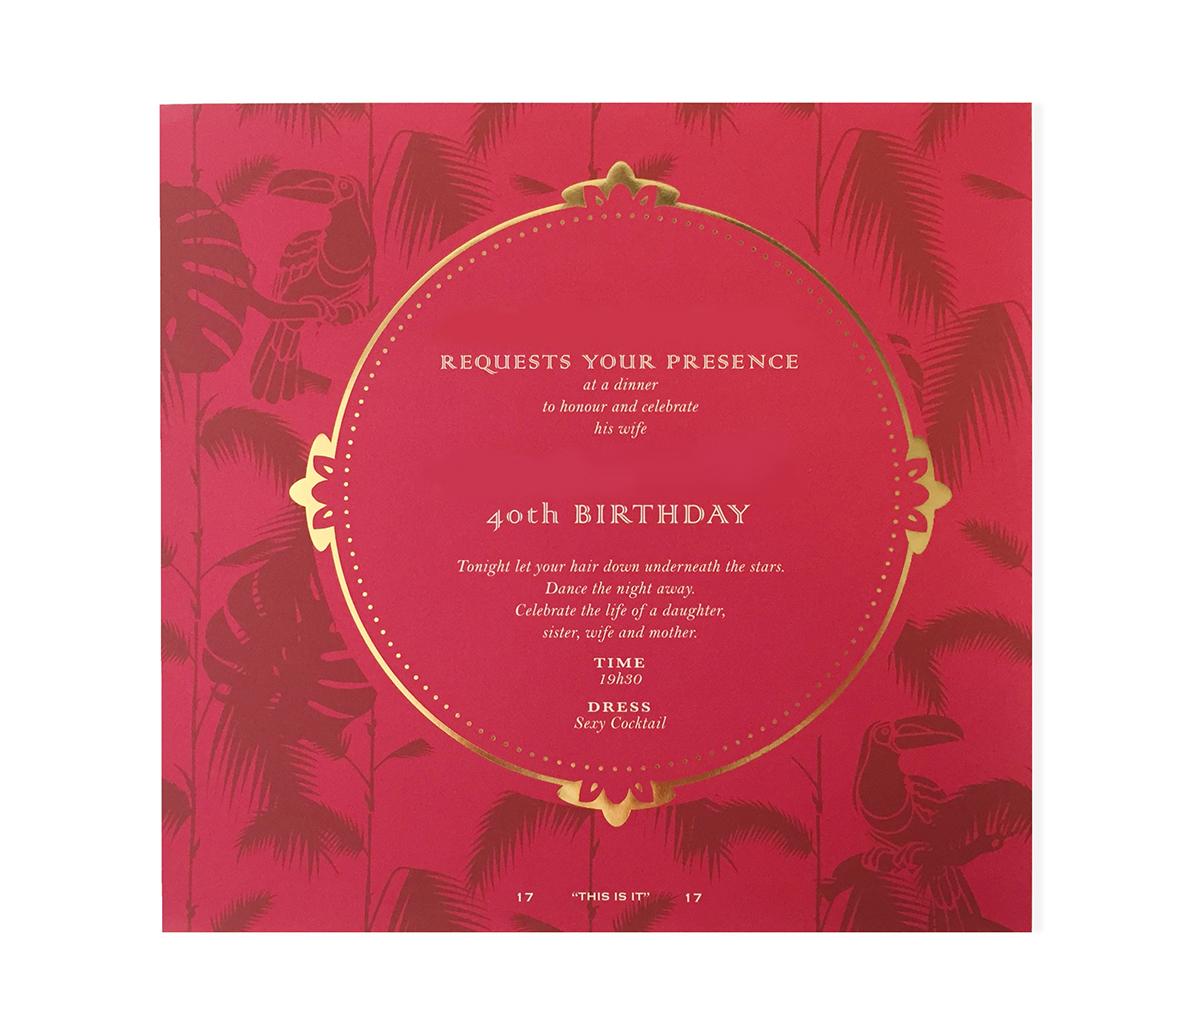 40th Birthday Invitation on Behance